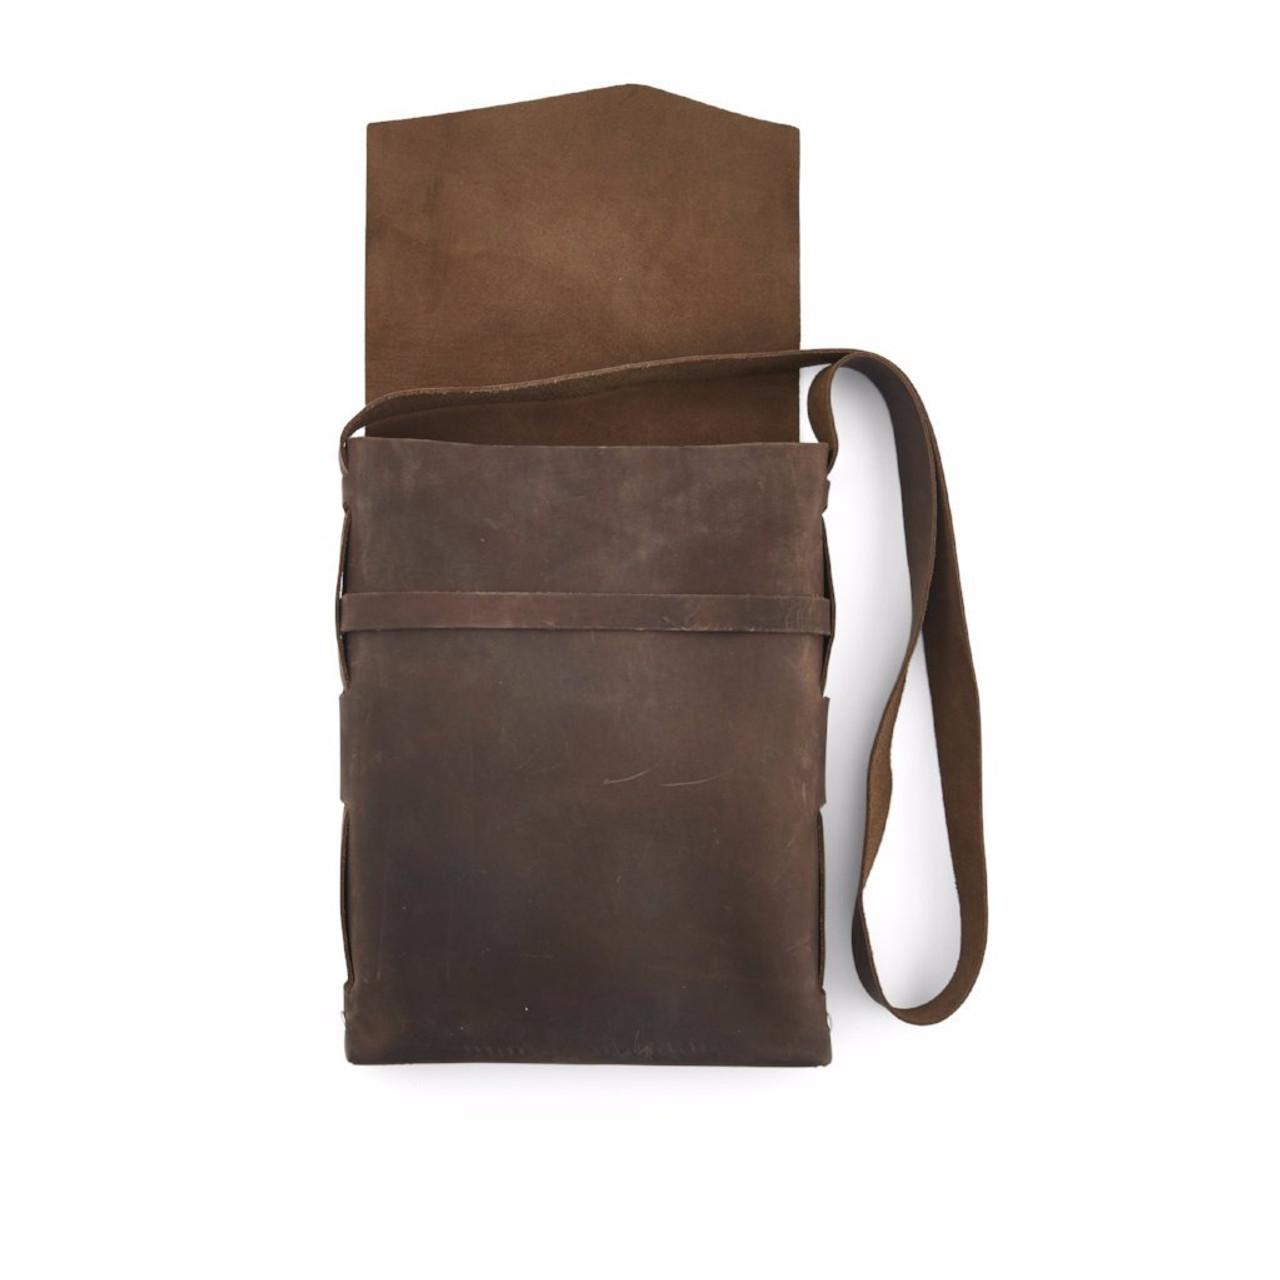 Leather Satchel - Explorer by Rustico - Dark Brown - Open